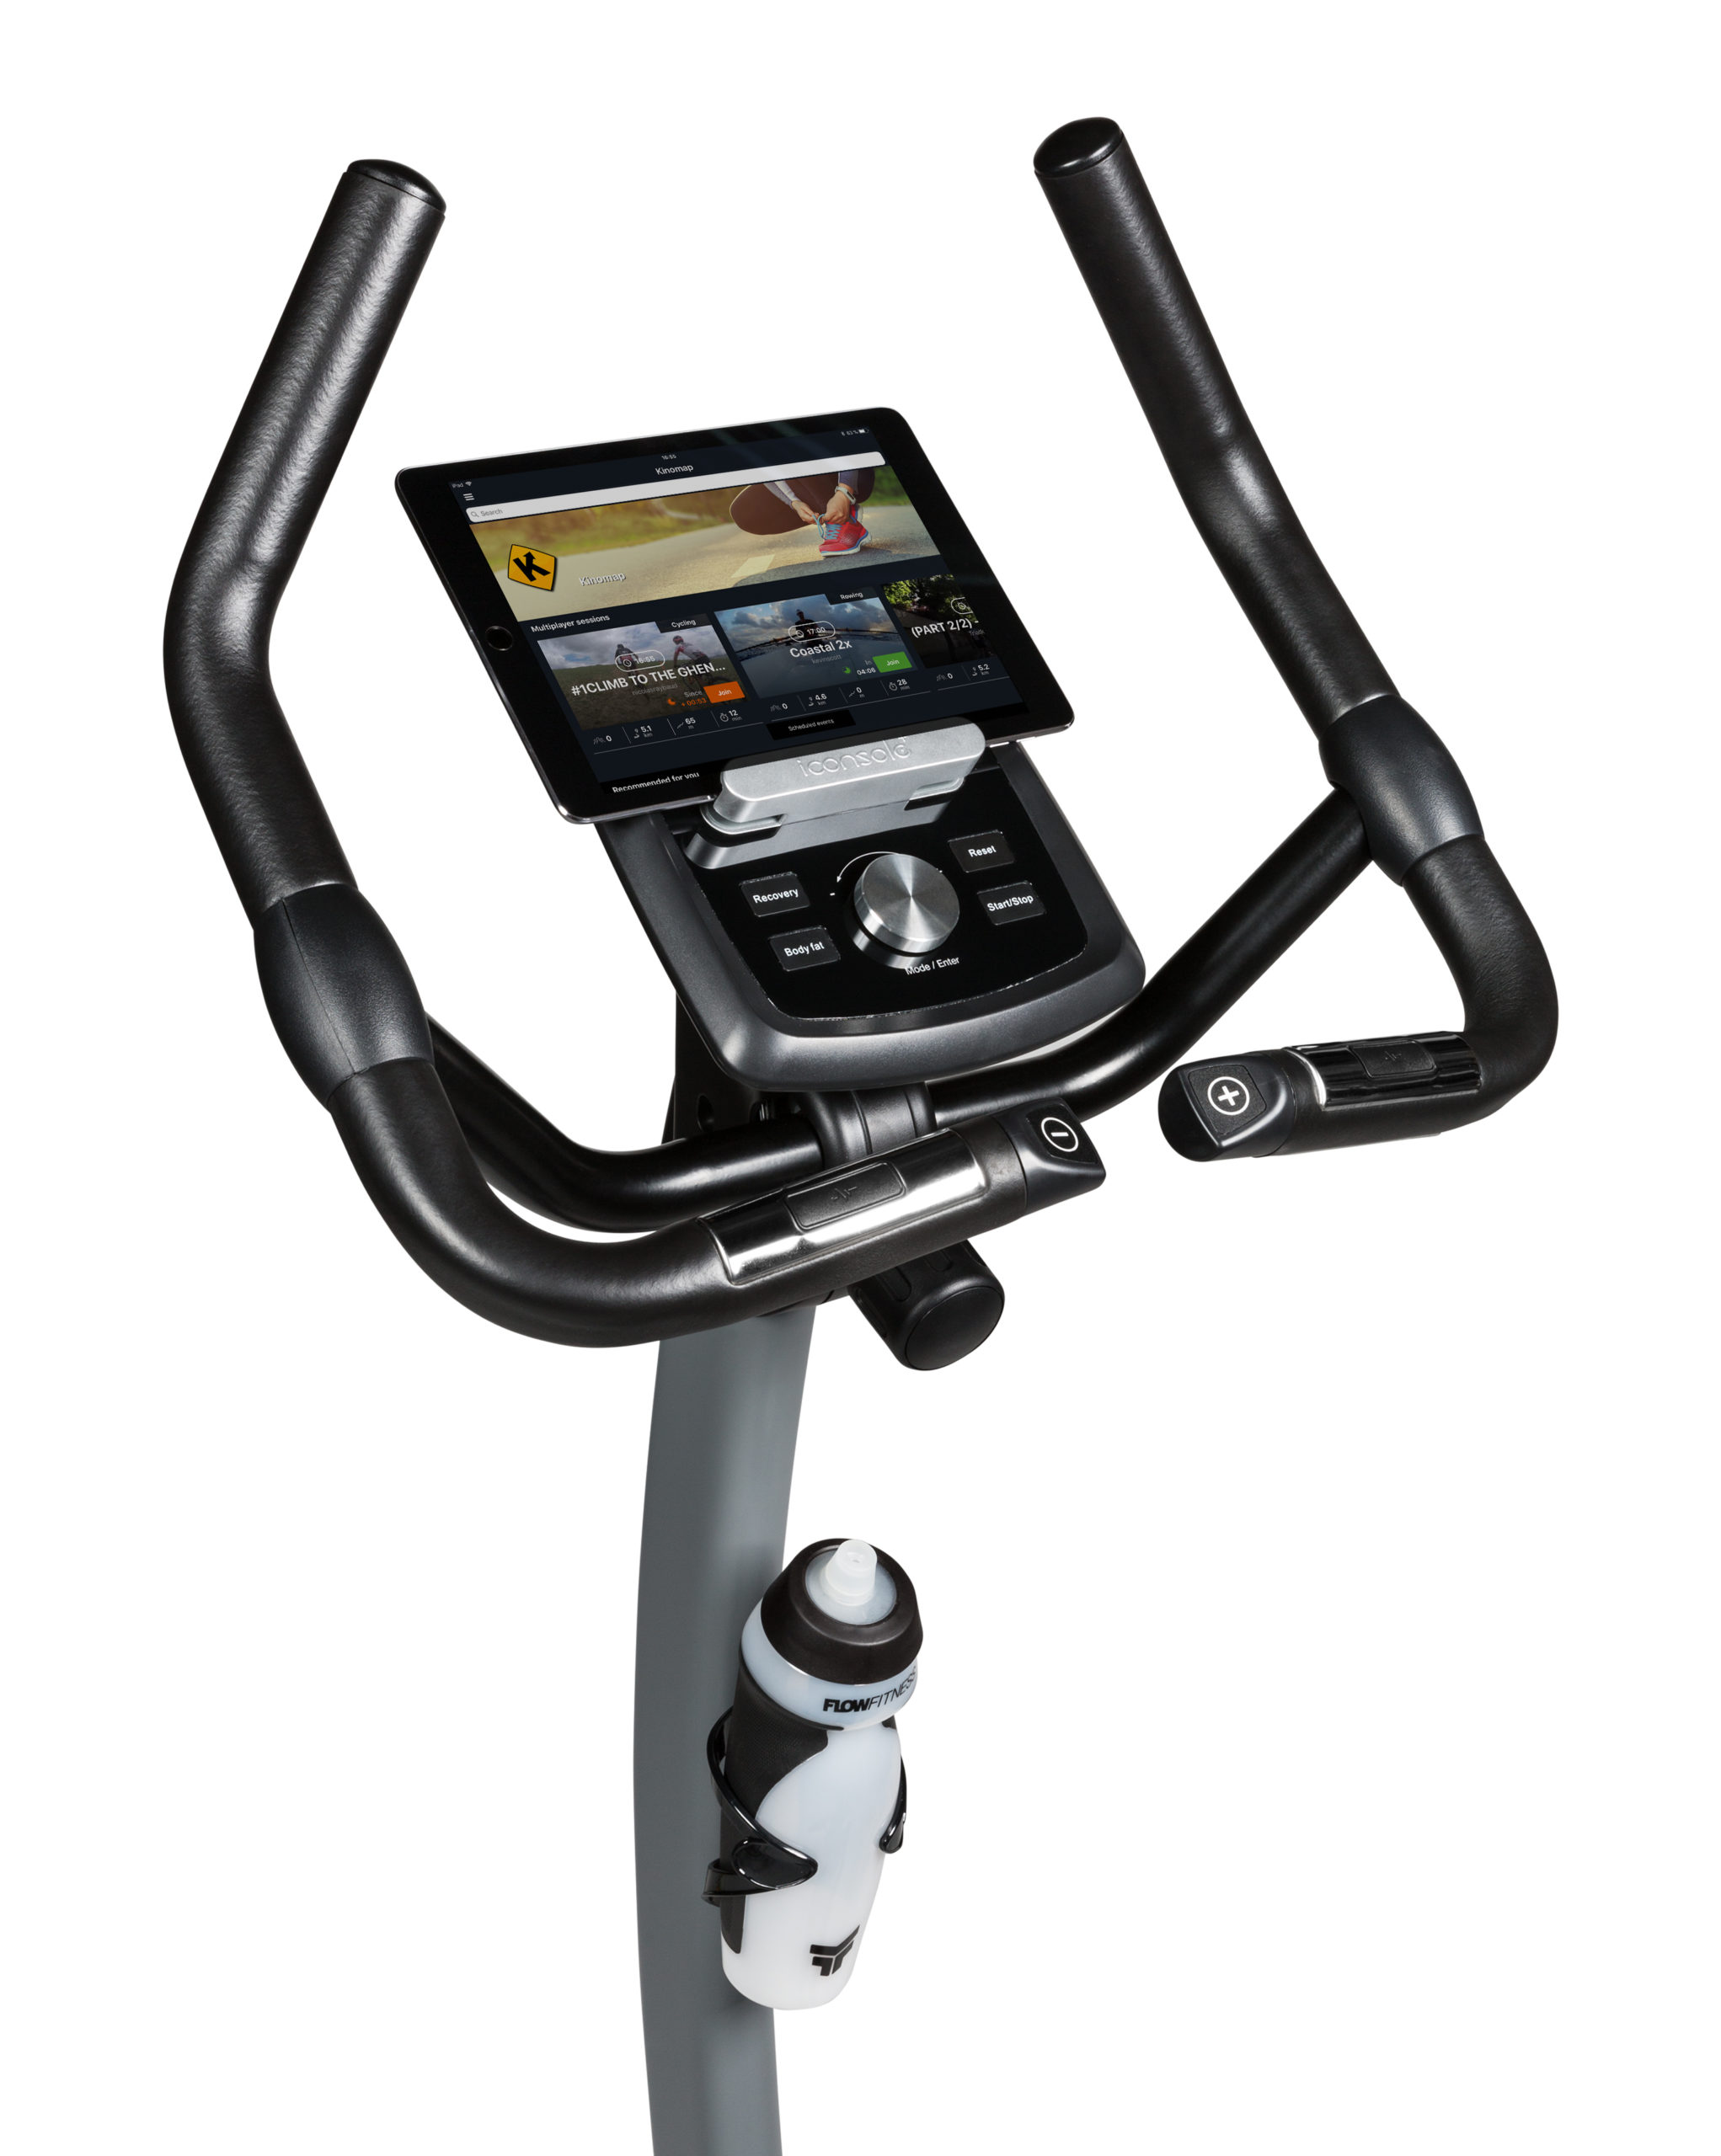 Flow Fitness Tabel Turner DHT2500i Hometrainer